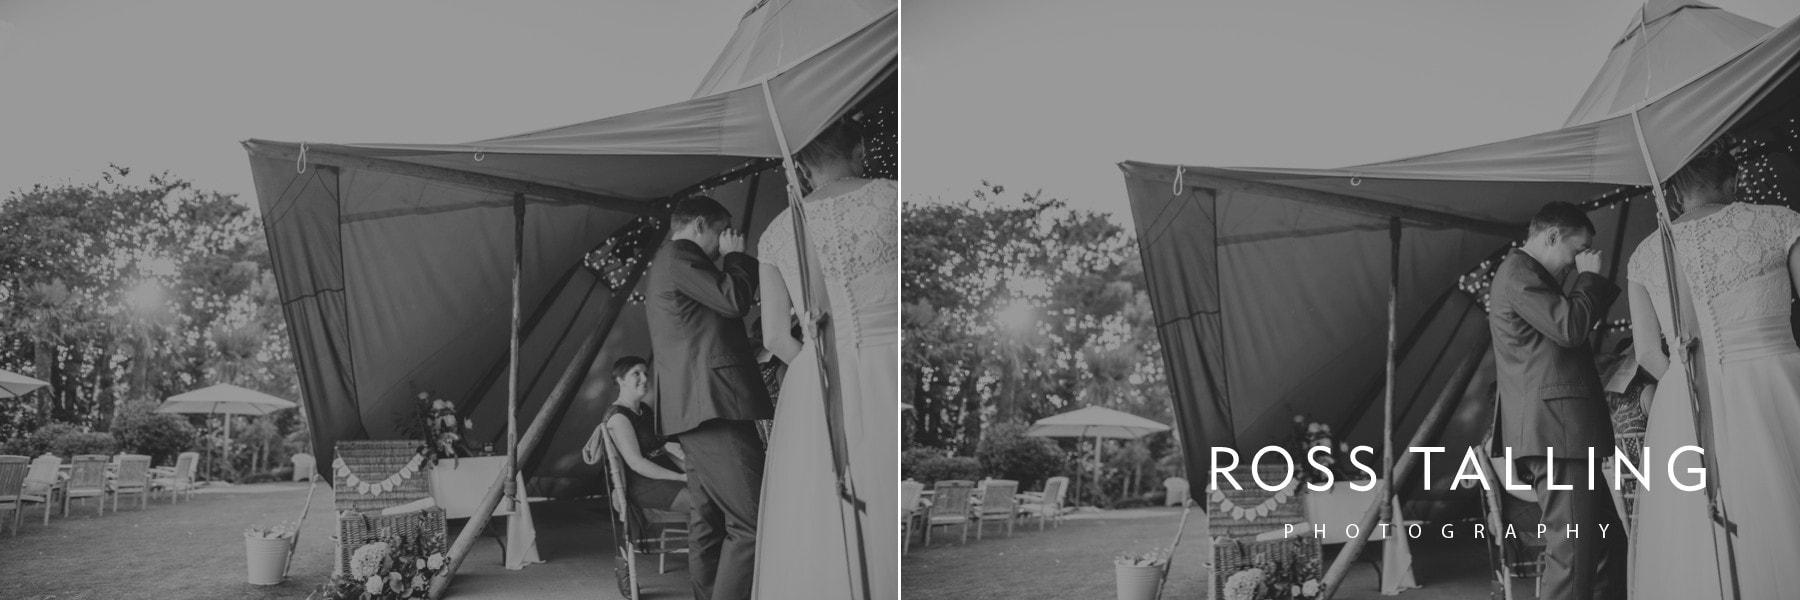 laura-matts-rosevine-hotel-wedding-photography-cornwall_0179